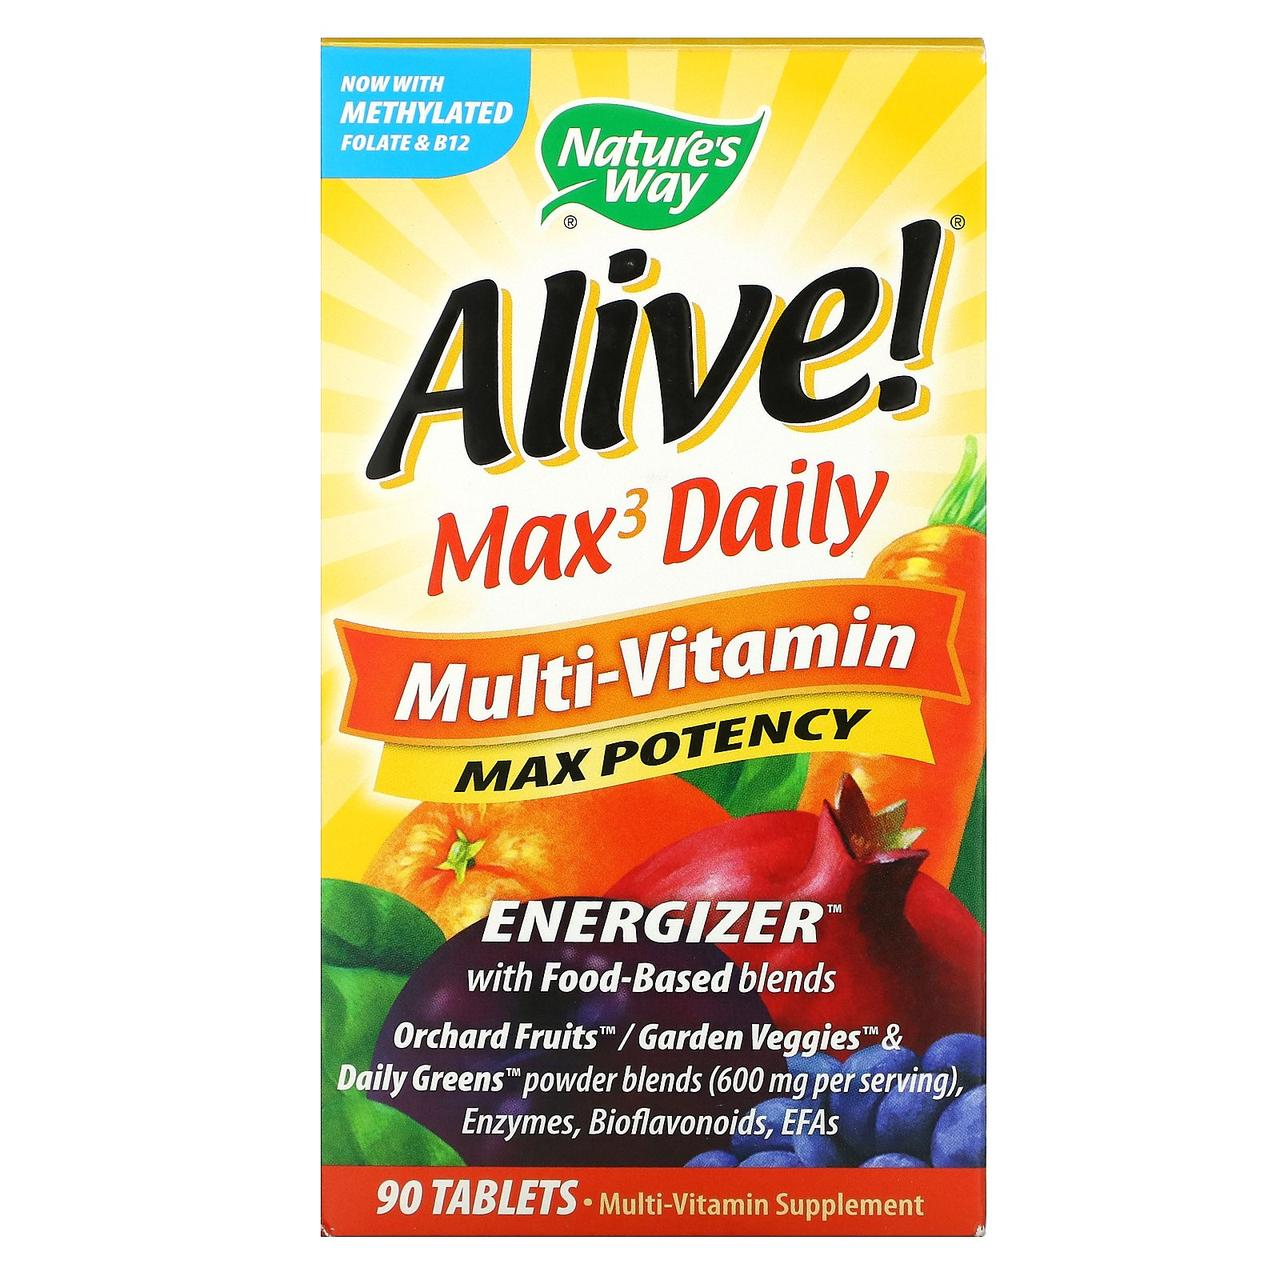 Мультивитамины (Multi-Vitamin),  Nature's Way, 90 таблеток